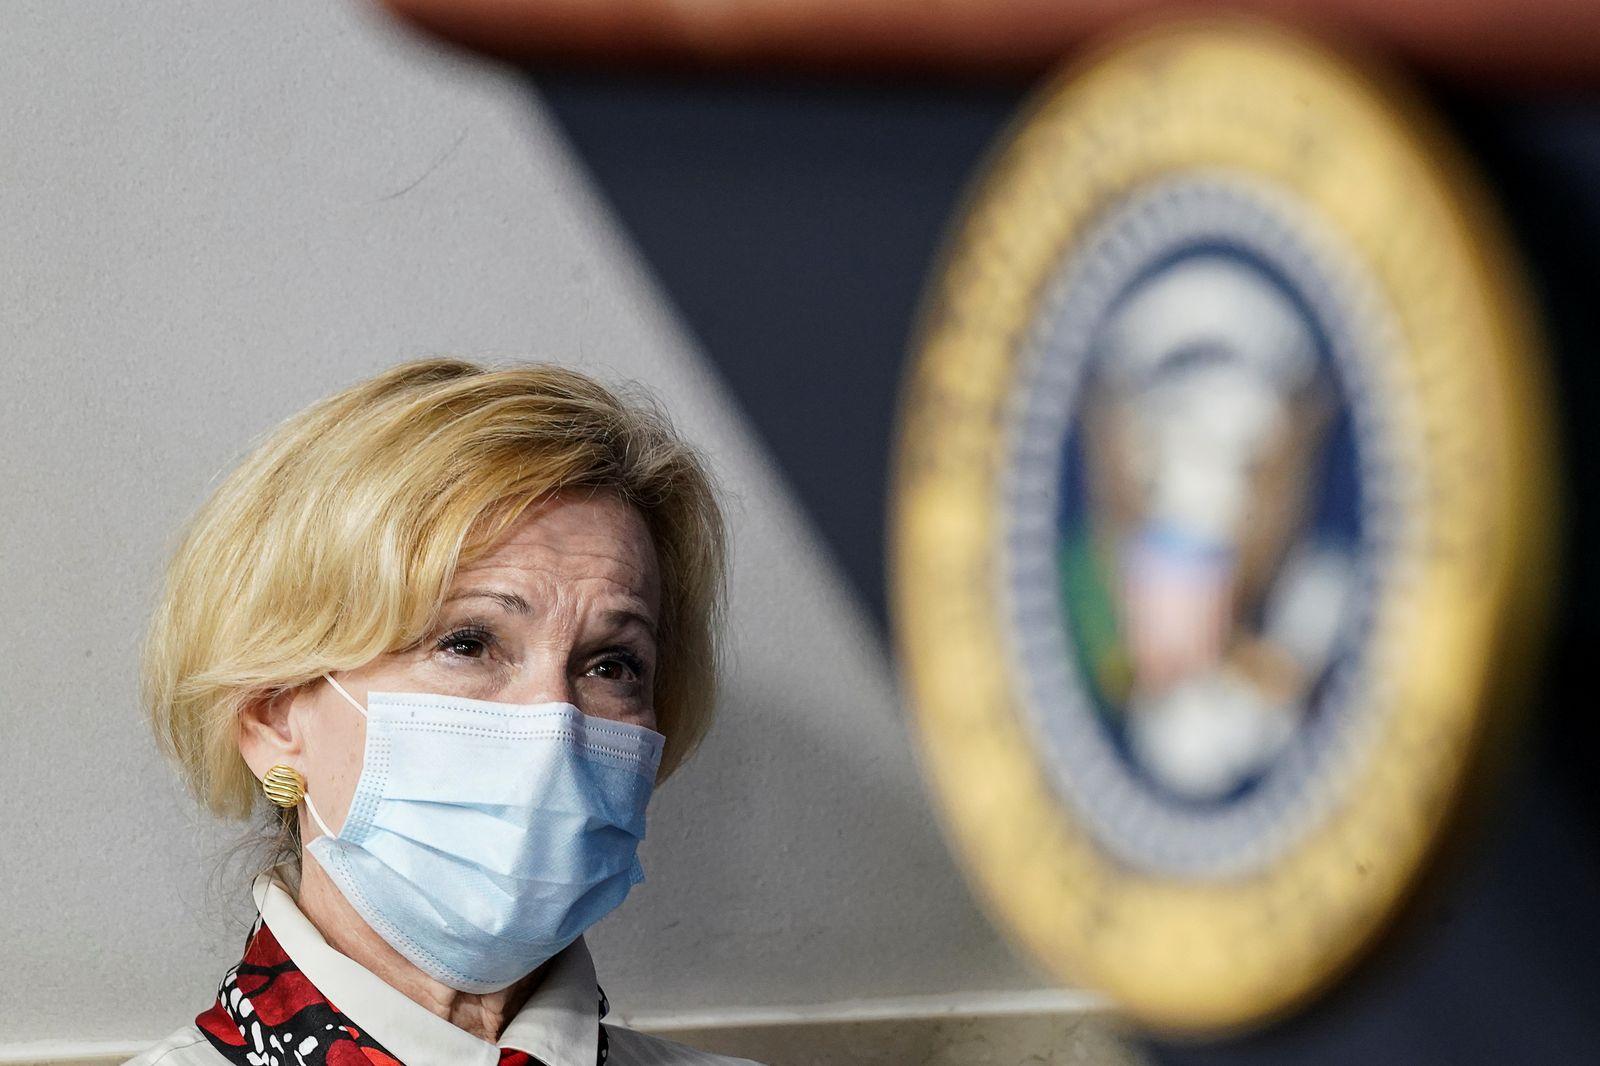 White House coronavirus response coordinator Birx attends coronavirus response task force briefing at the White House in Washington